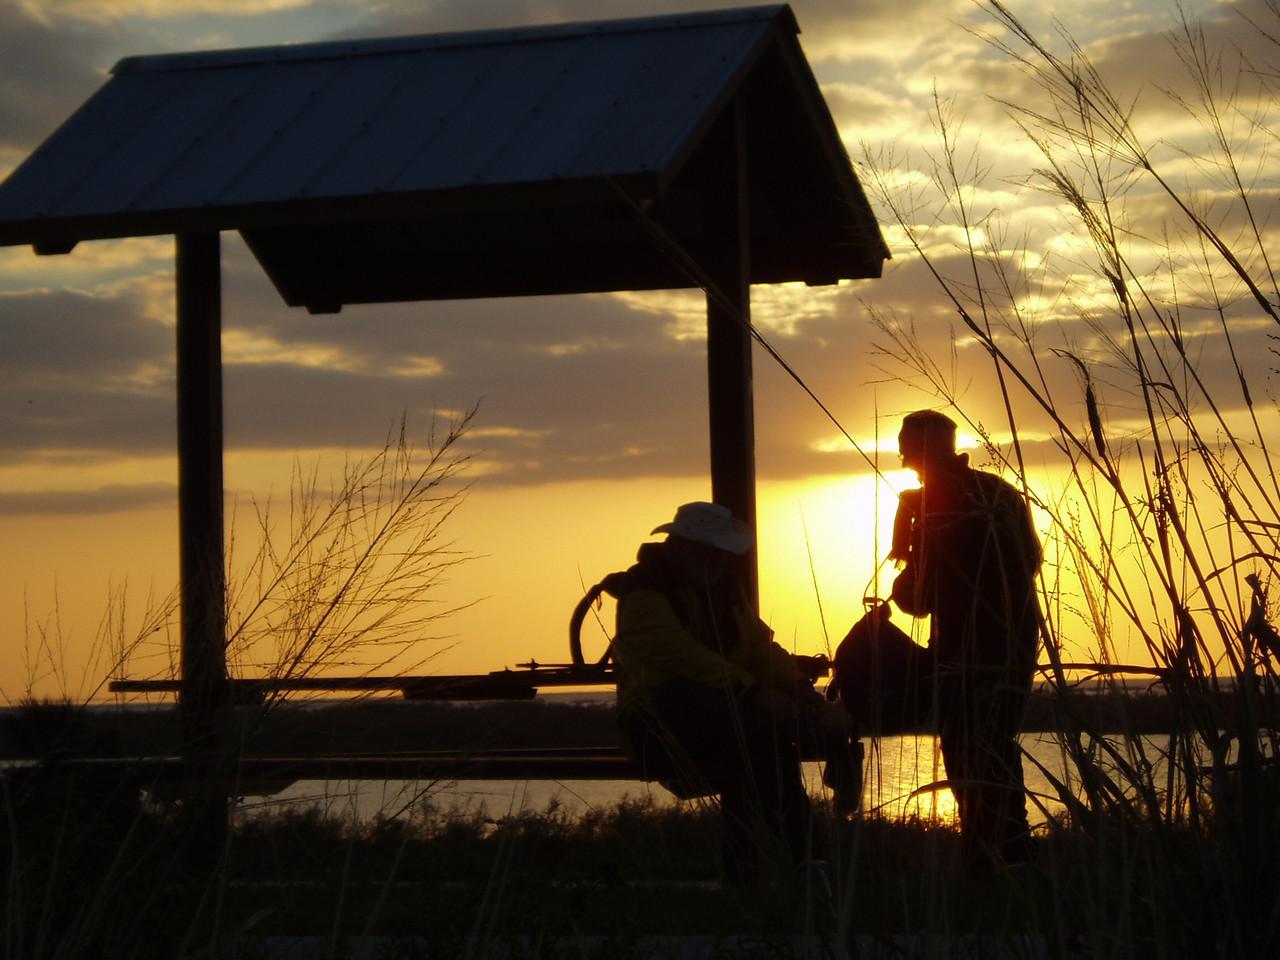 Hikers at a rest stop along Lake Okeechobee<br /> location: Okeechobee<br /> PHOTO CREDIT: Robert Coveney / Florida Trail Association